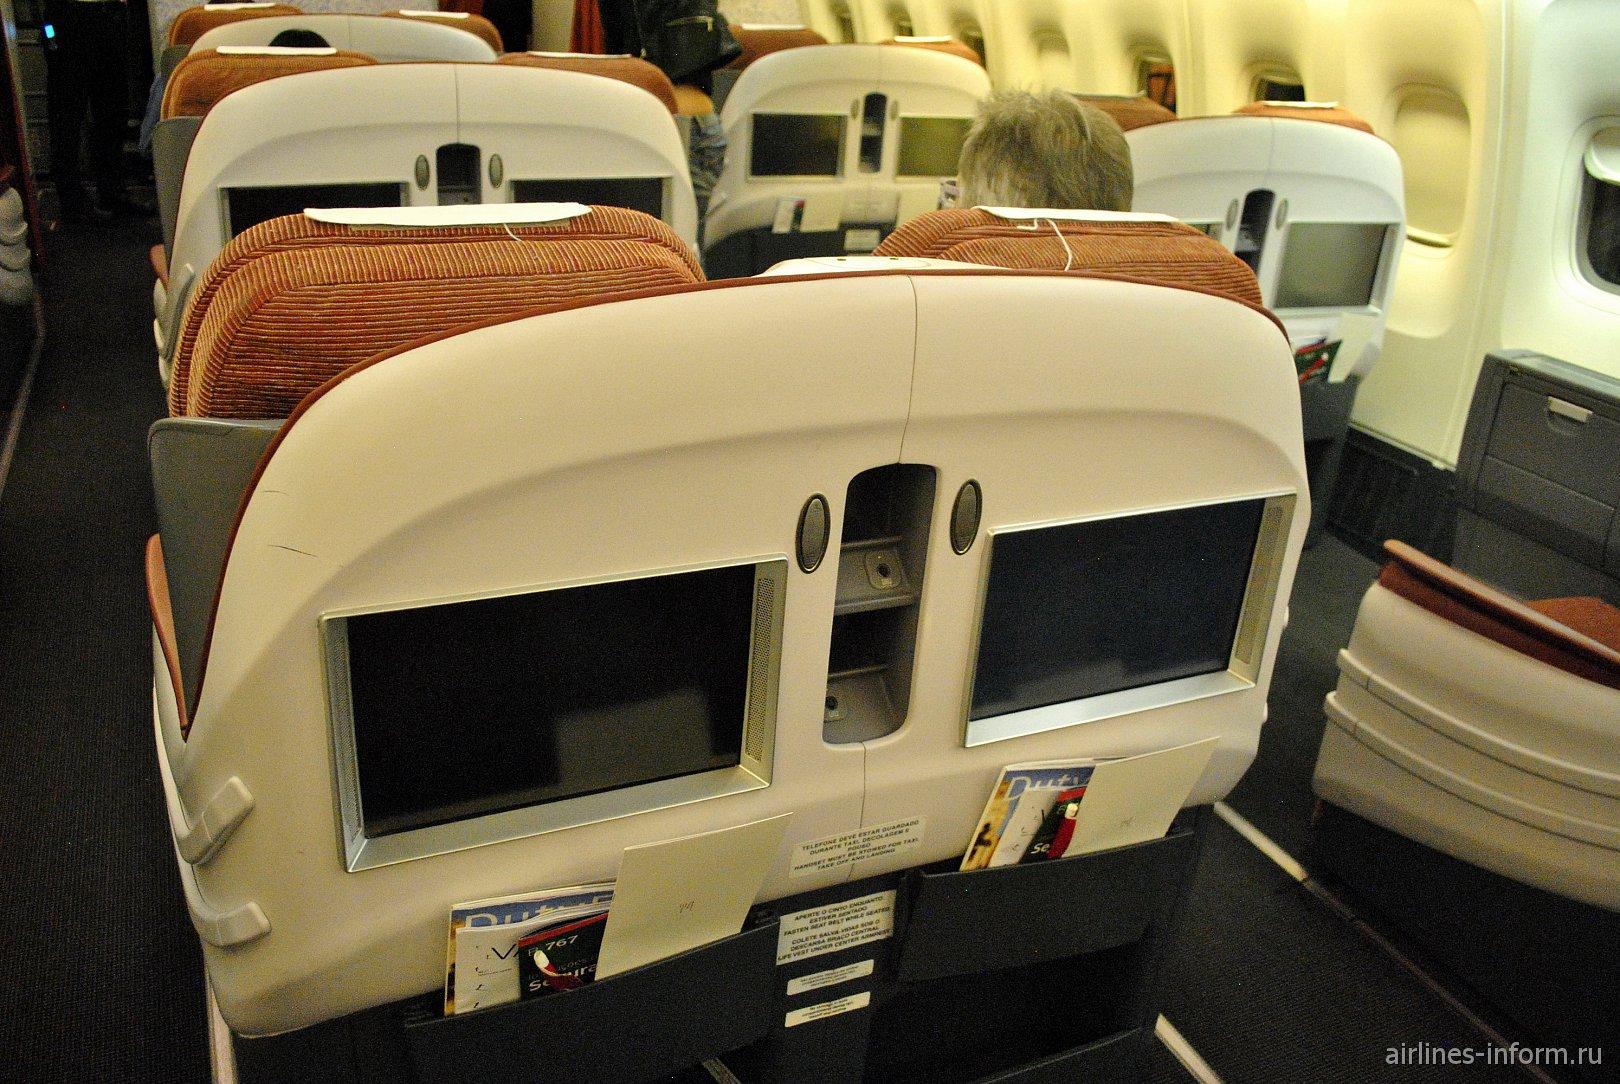 Дисплеи IFE в бизнес-классе Боинга-767-300 авиакомпании LATAM Brasil